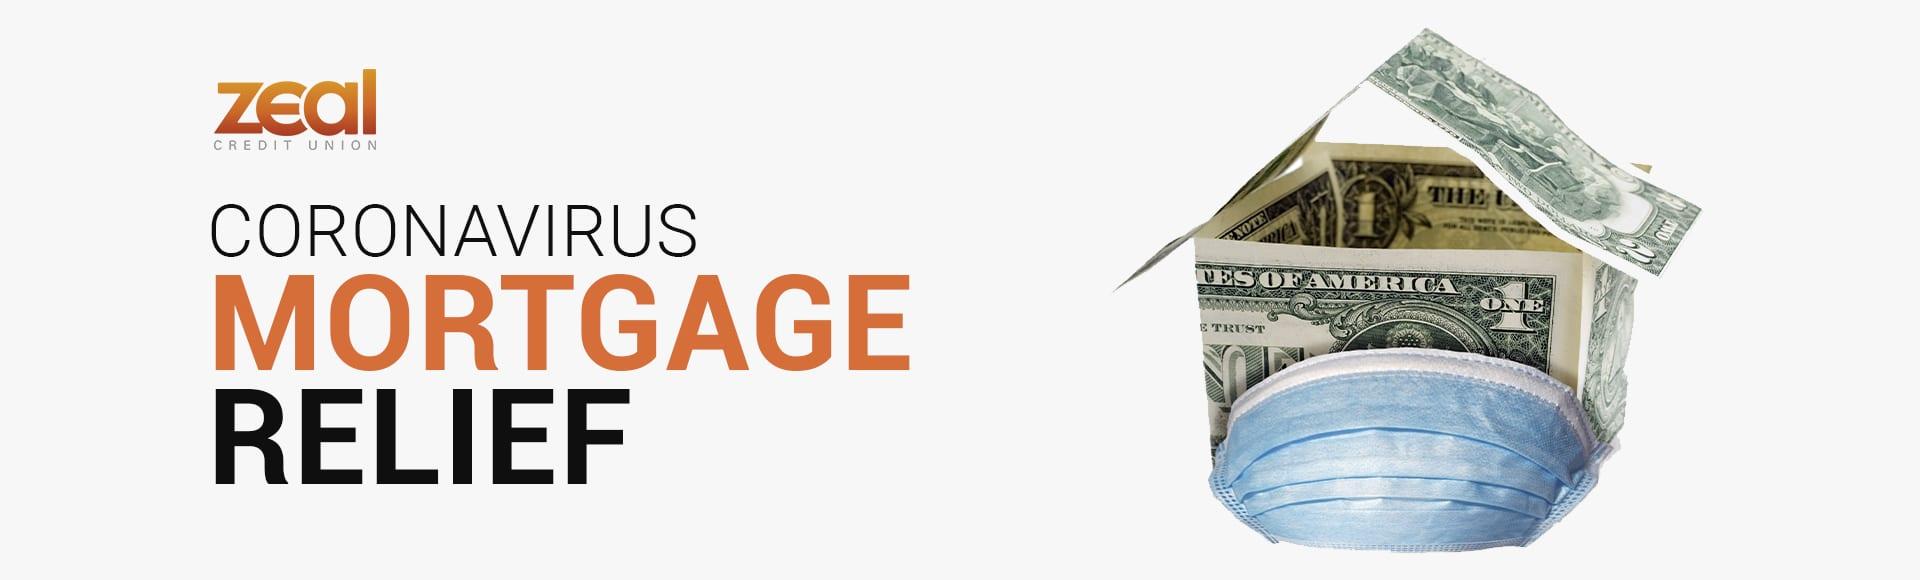 coronavirus mask covering house made of dollar bills